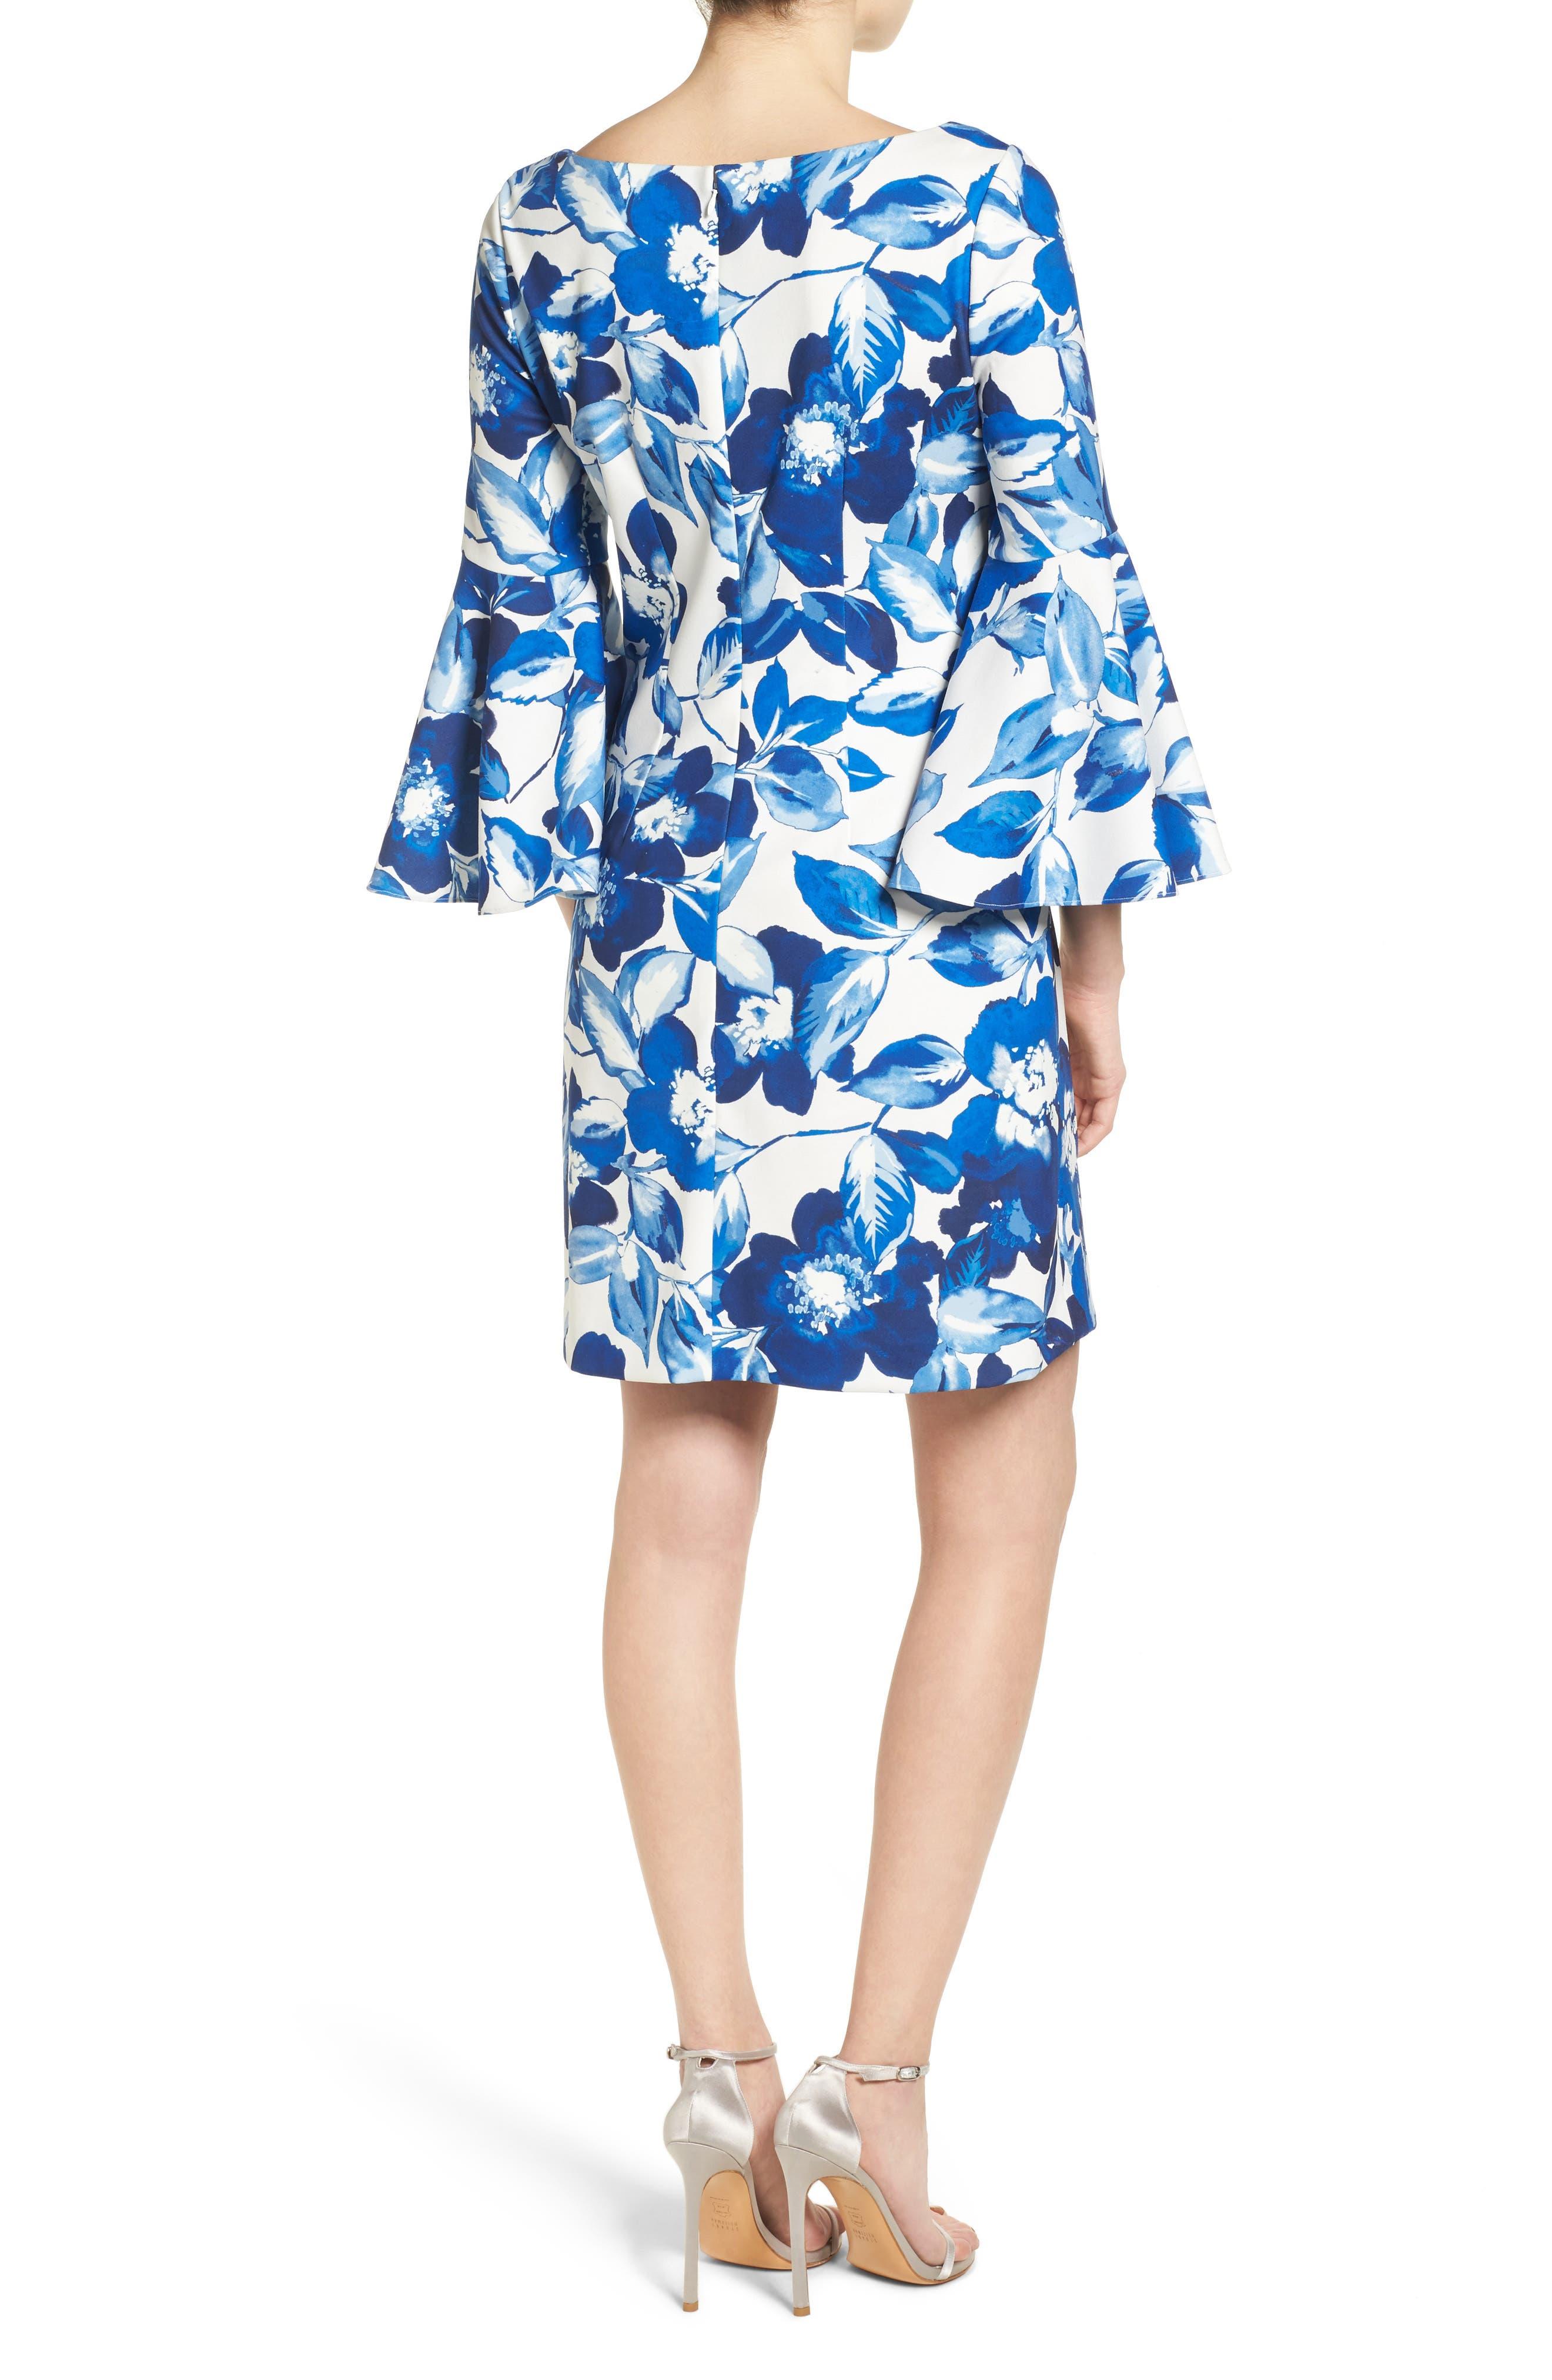 Floral Shift Dress,                             Alternate thumbnail 2, color,                             BLUE/ IVORY